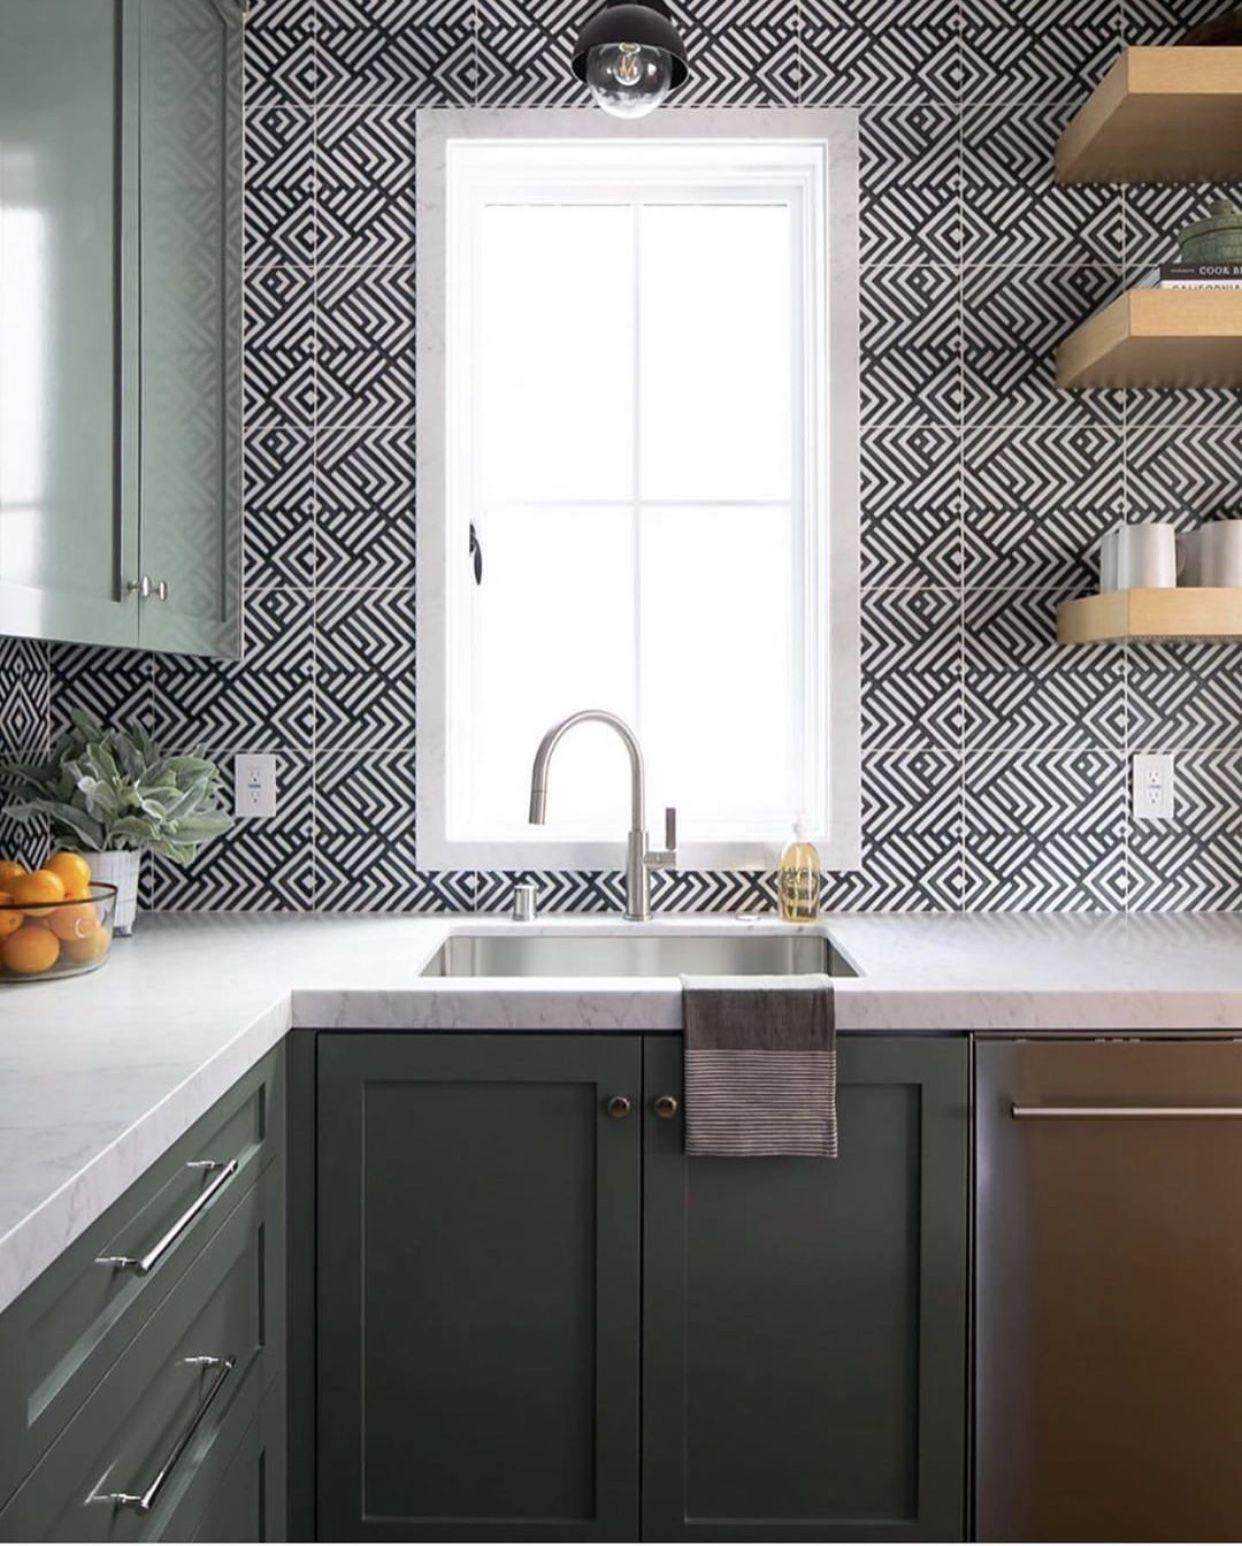 Simple Kitchen Wall Tile Designs Novocom Top